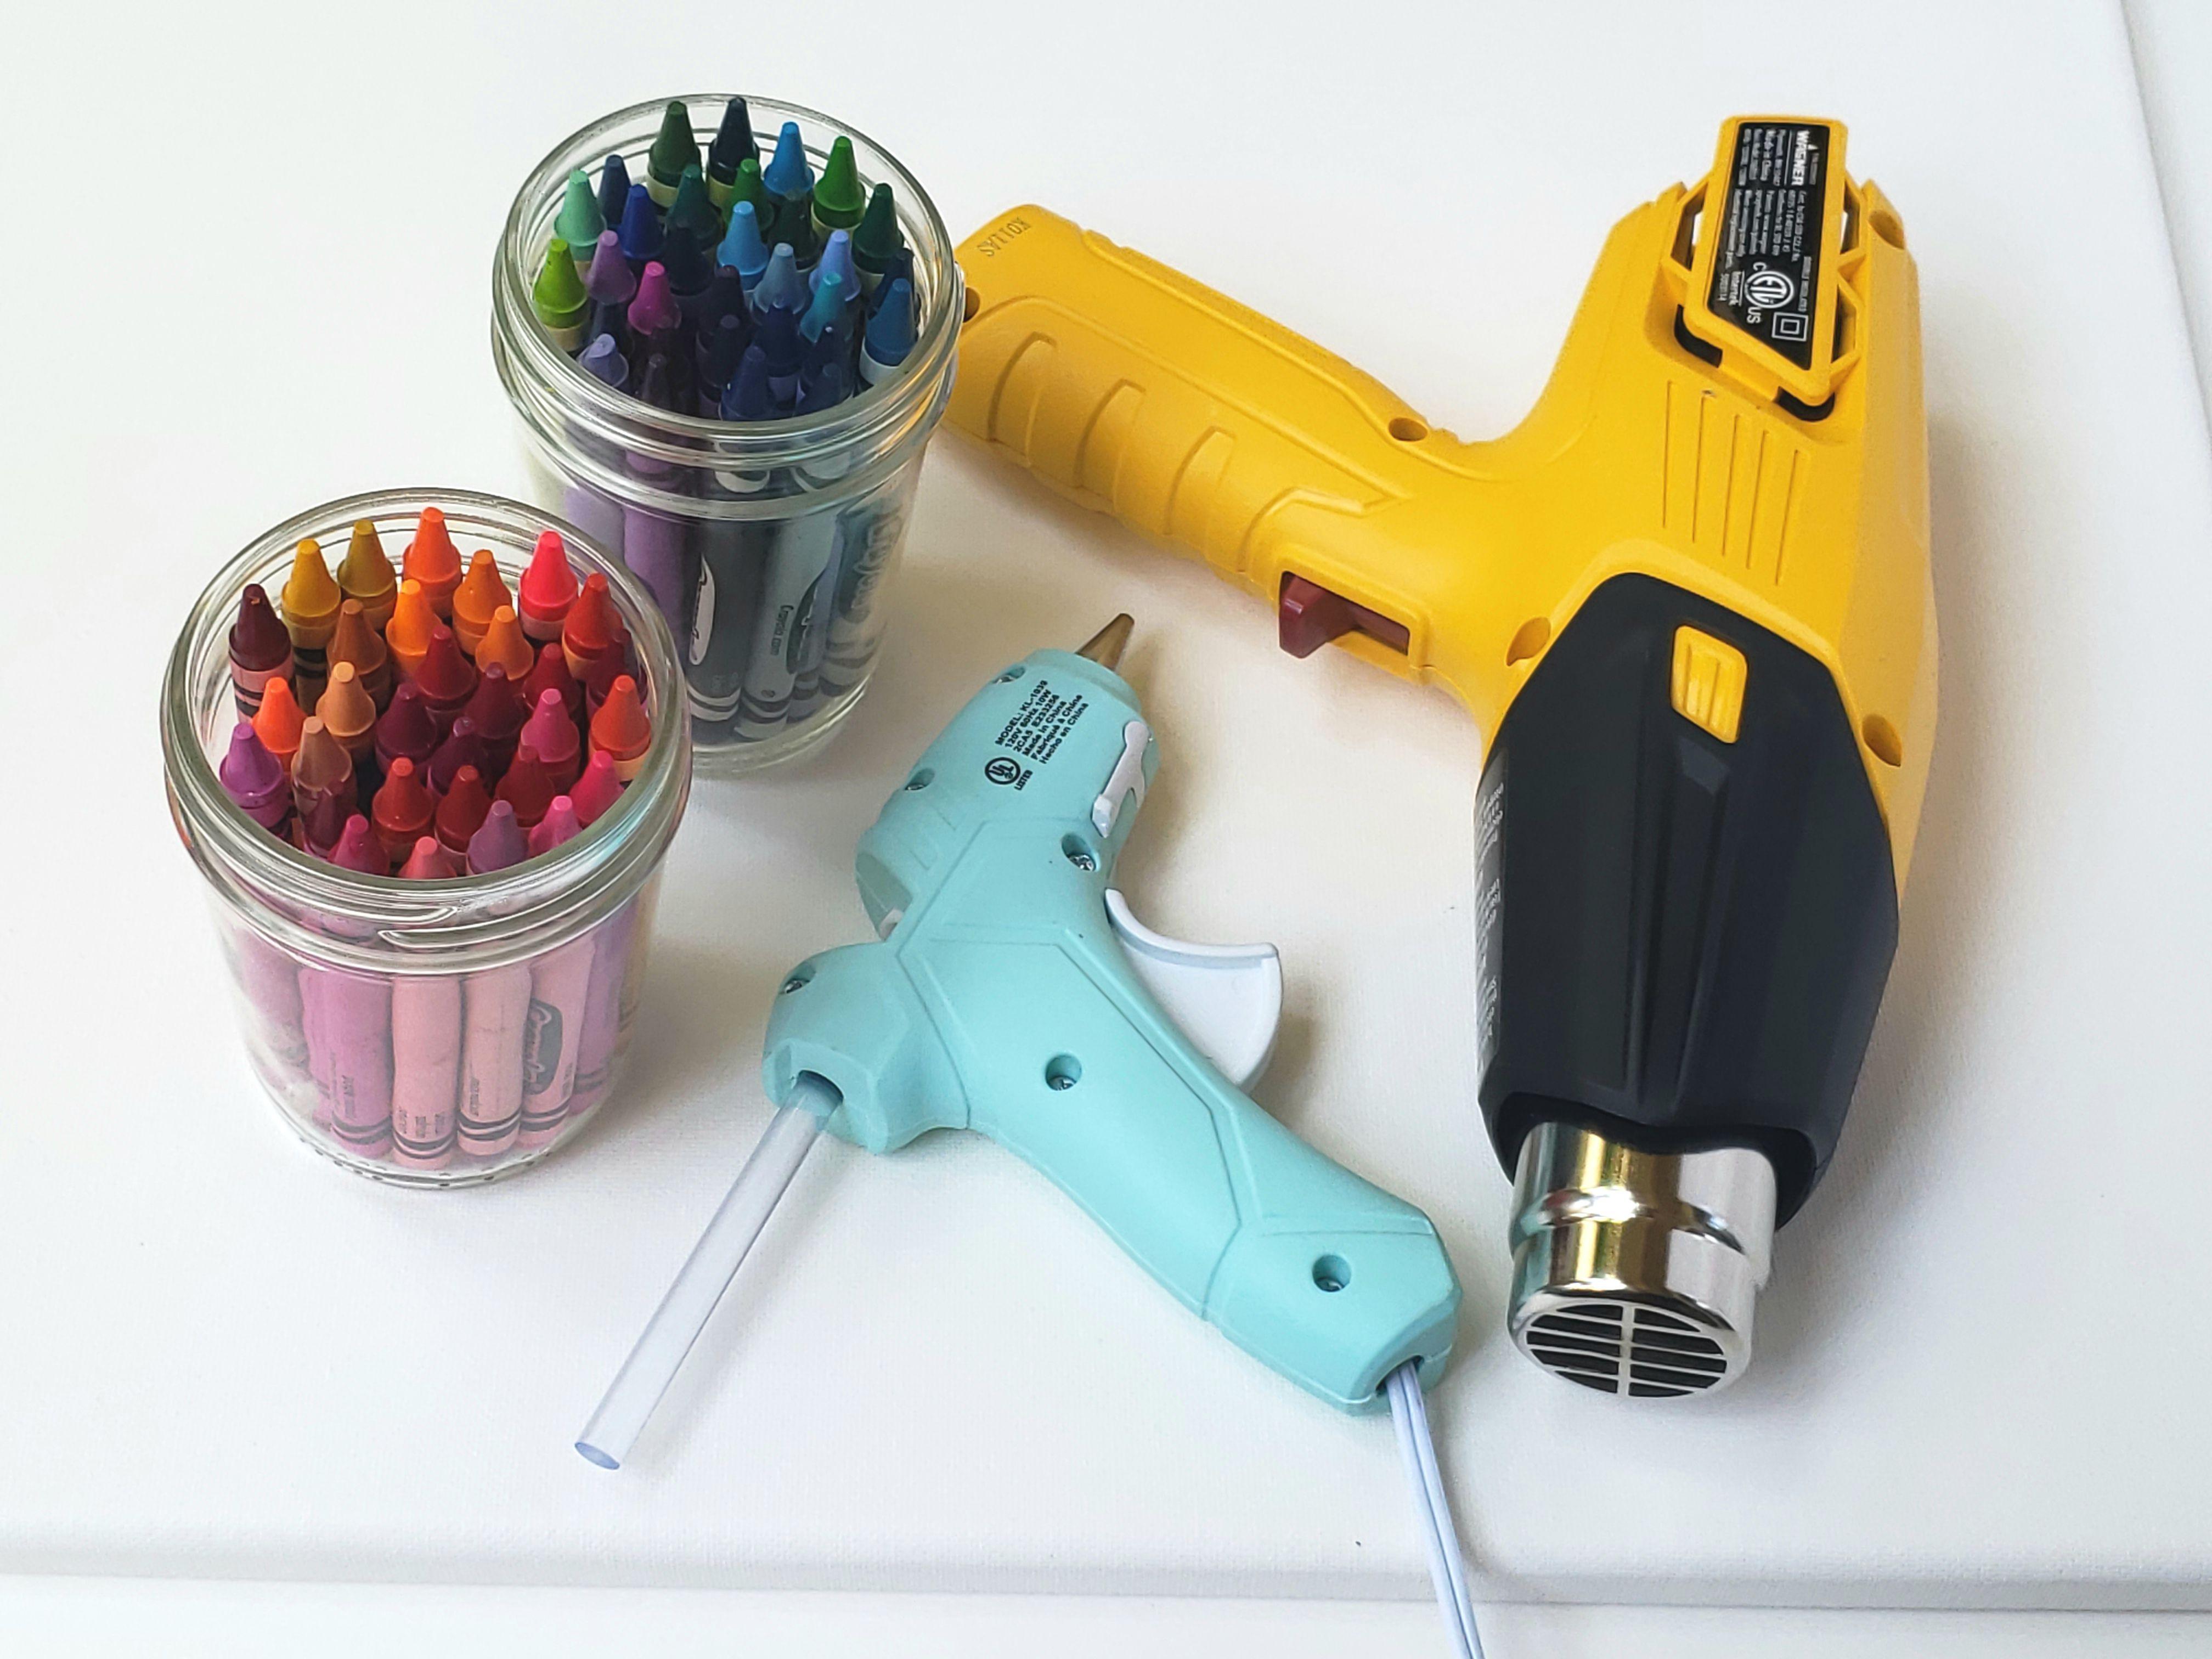 Crayons, a heat gun, and a hot glue gun